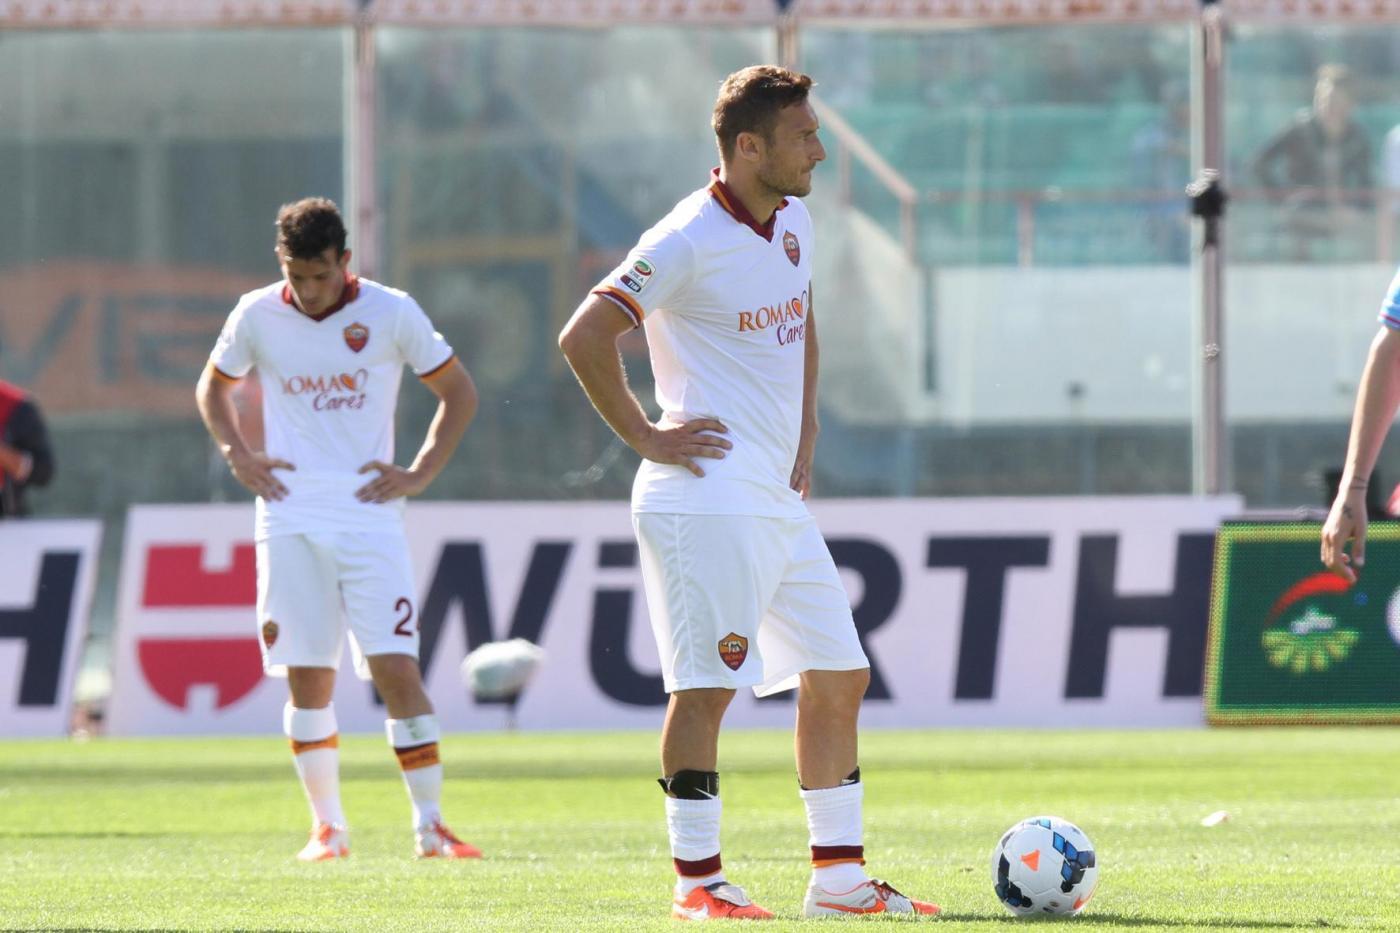 Roma sconfitta a Catania